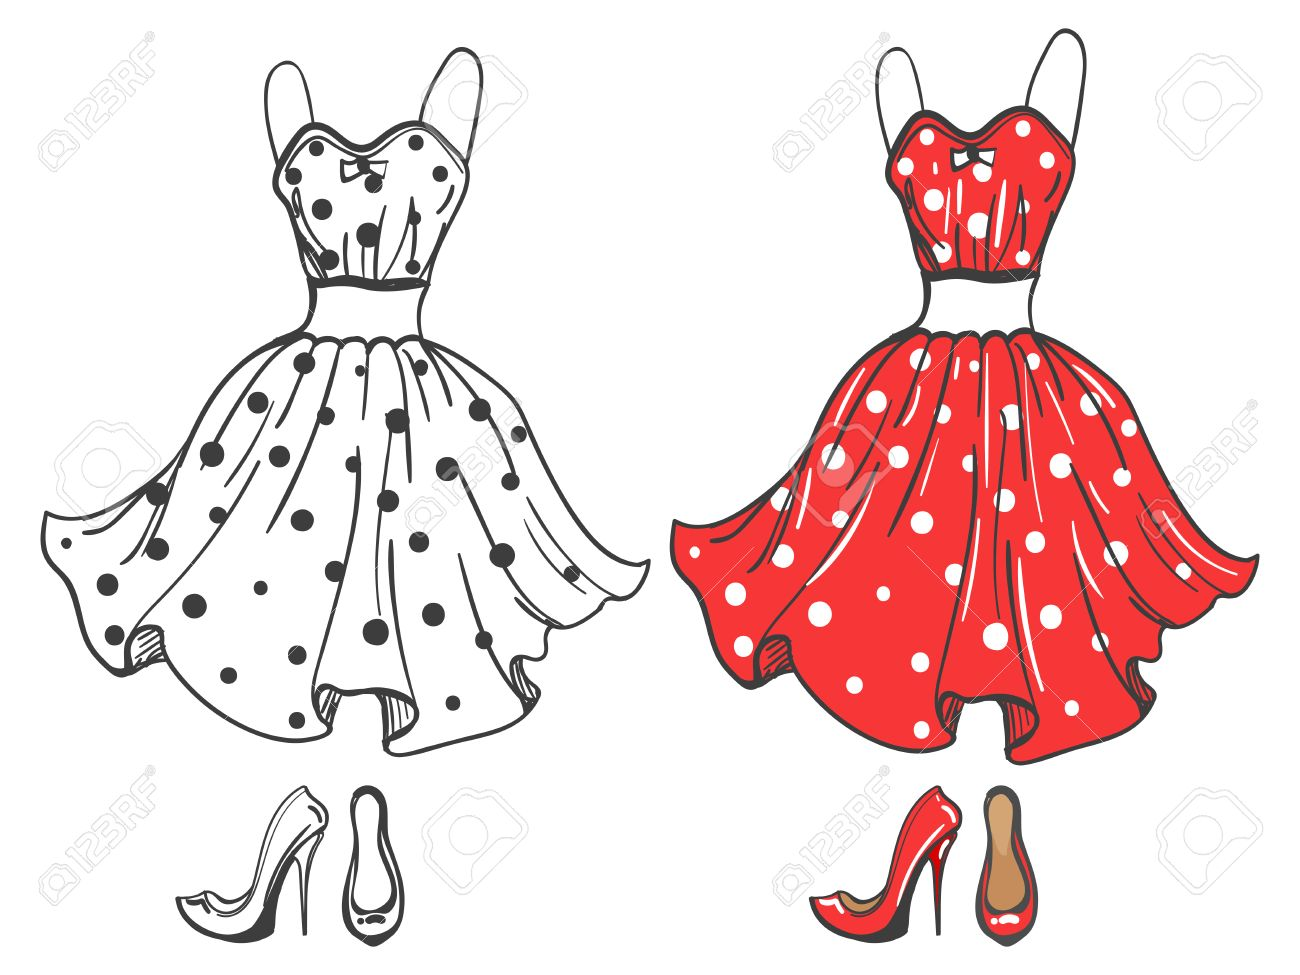 1300x975 Fashion Polka Dot Dress And Shoes. Vector Dress Sketch And Cartoon